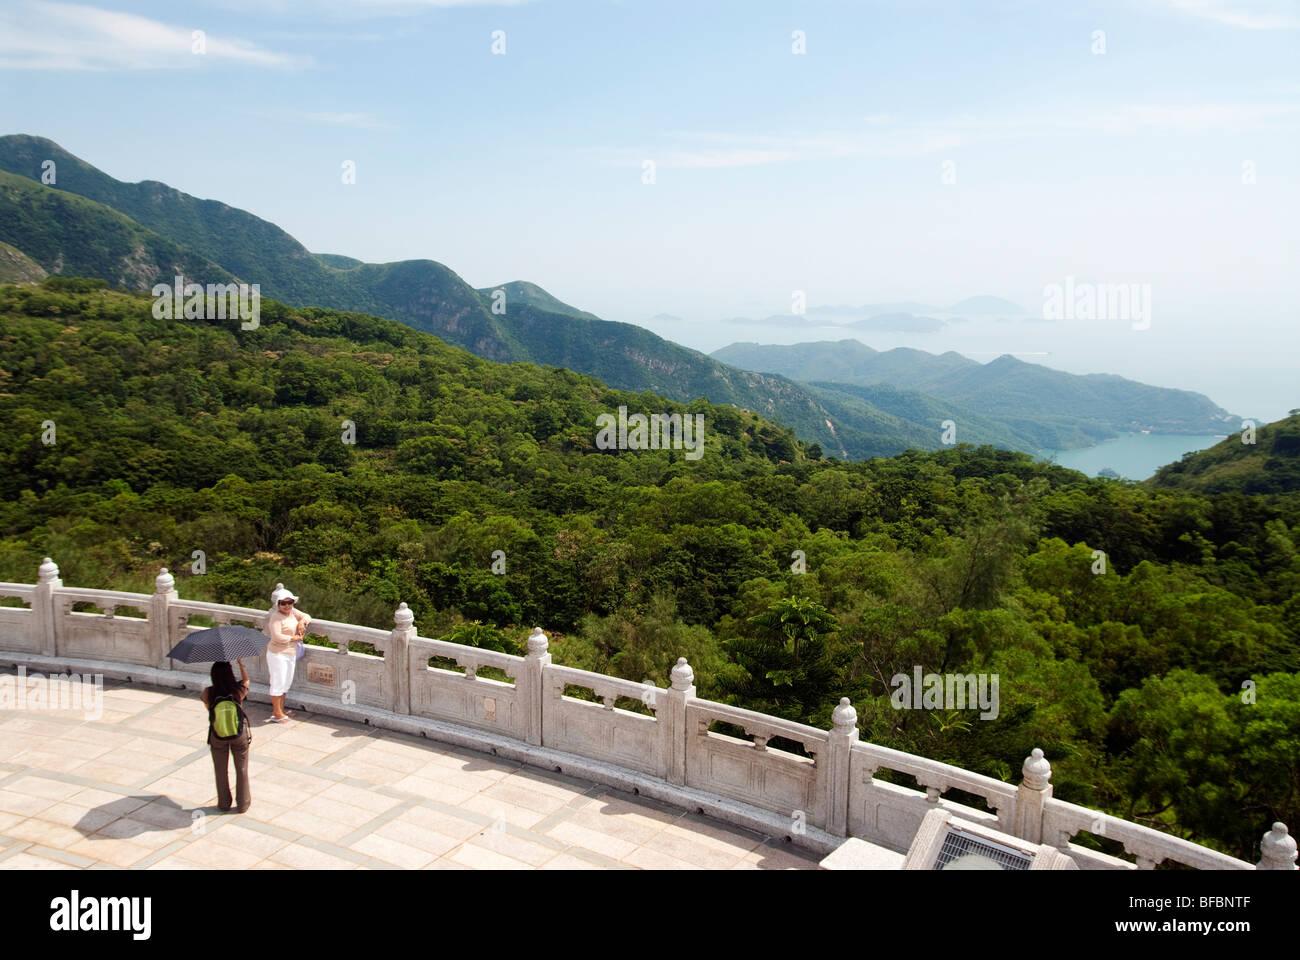 View from Tian Tan Big Buddha with woman posing for a photograph, Lantau island, Hong Kong - Stock Image